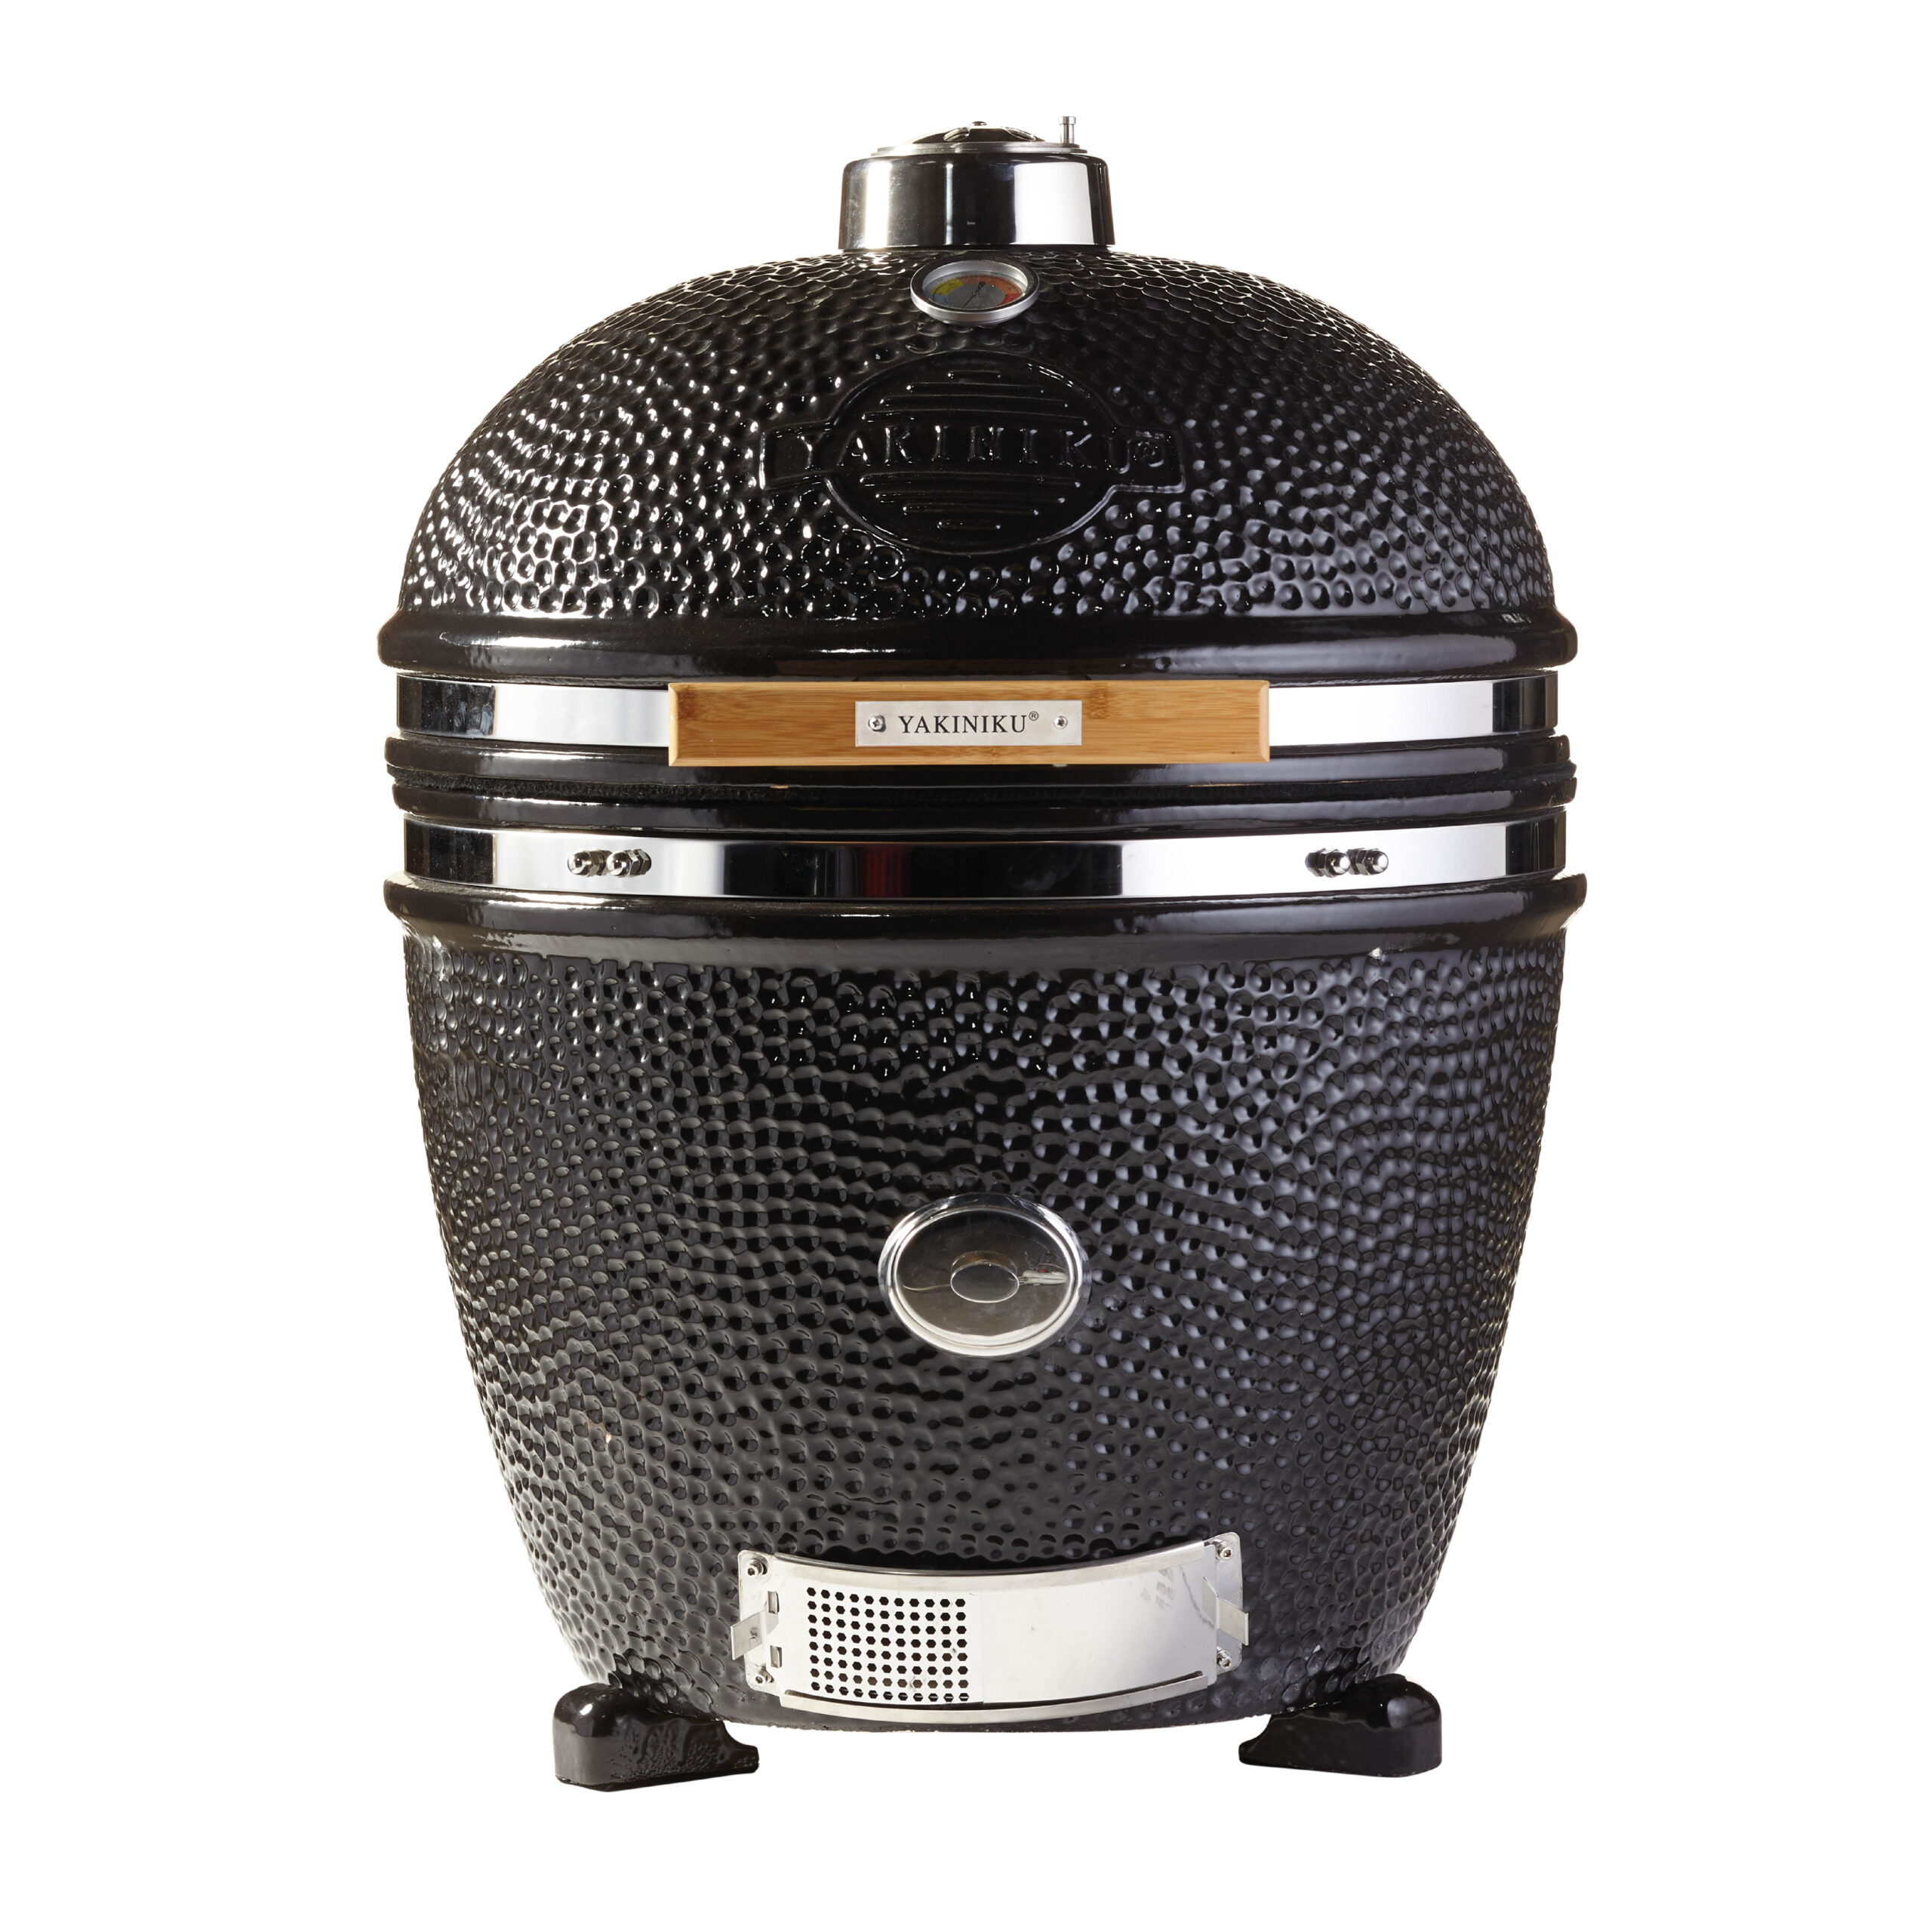 Yakiniku XL kamado BBQ 22 inch Solo